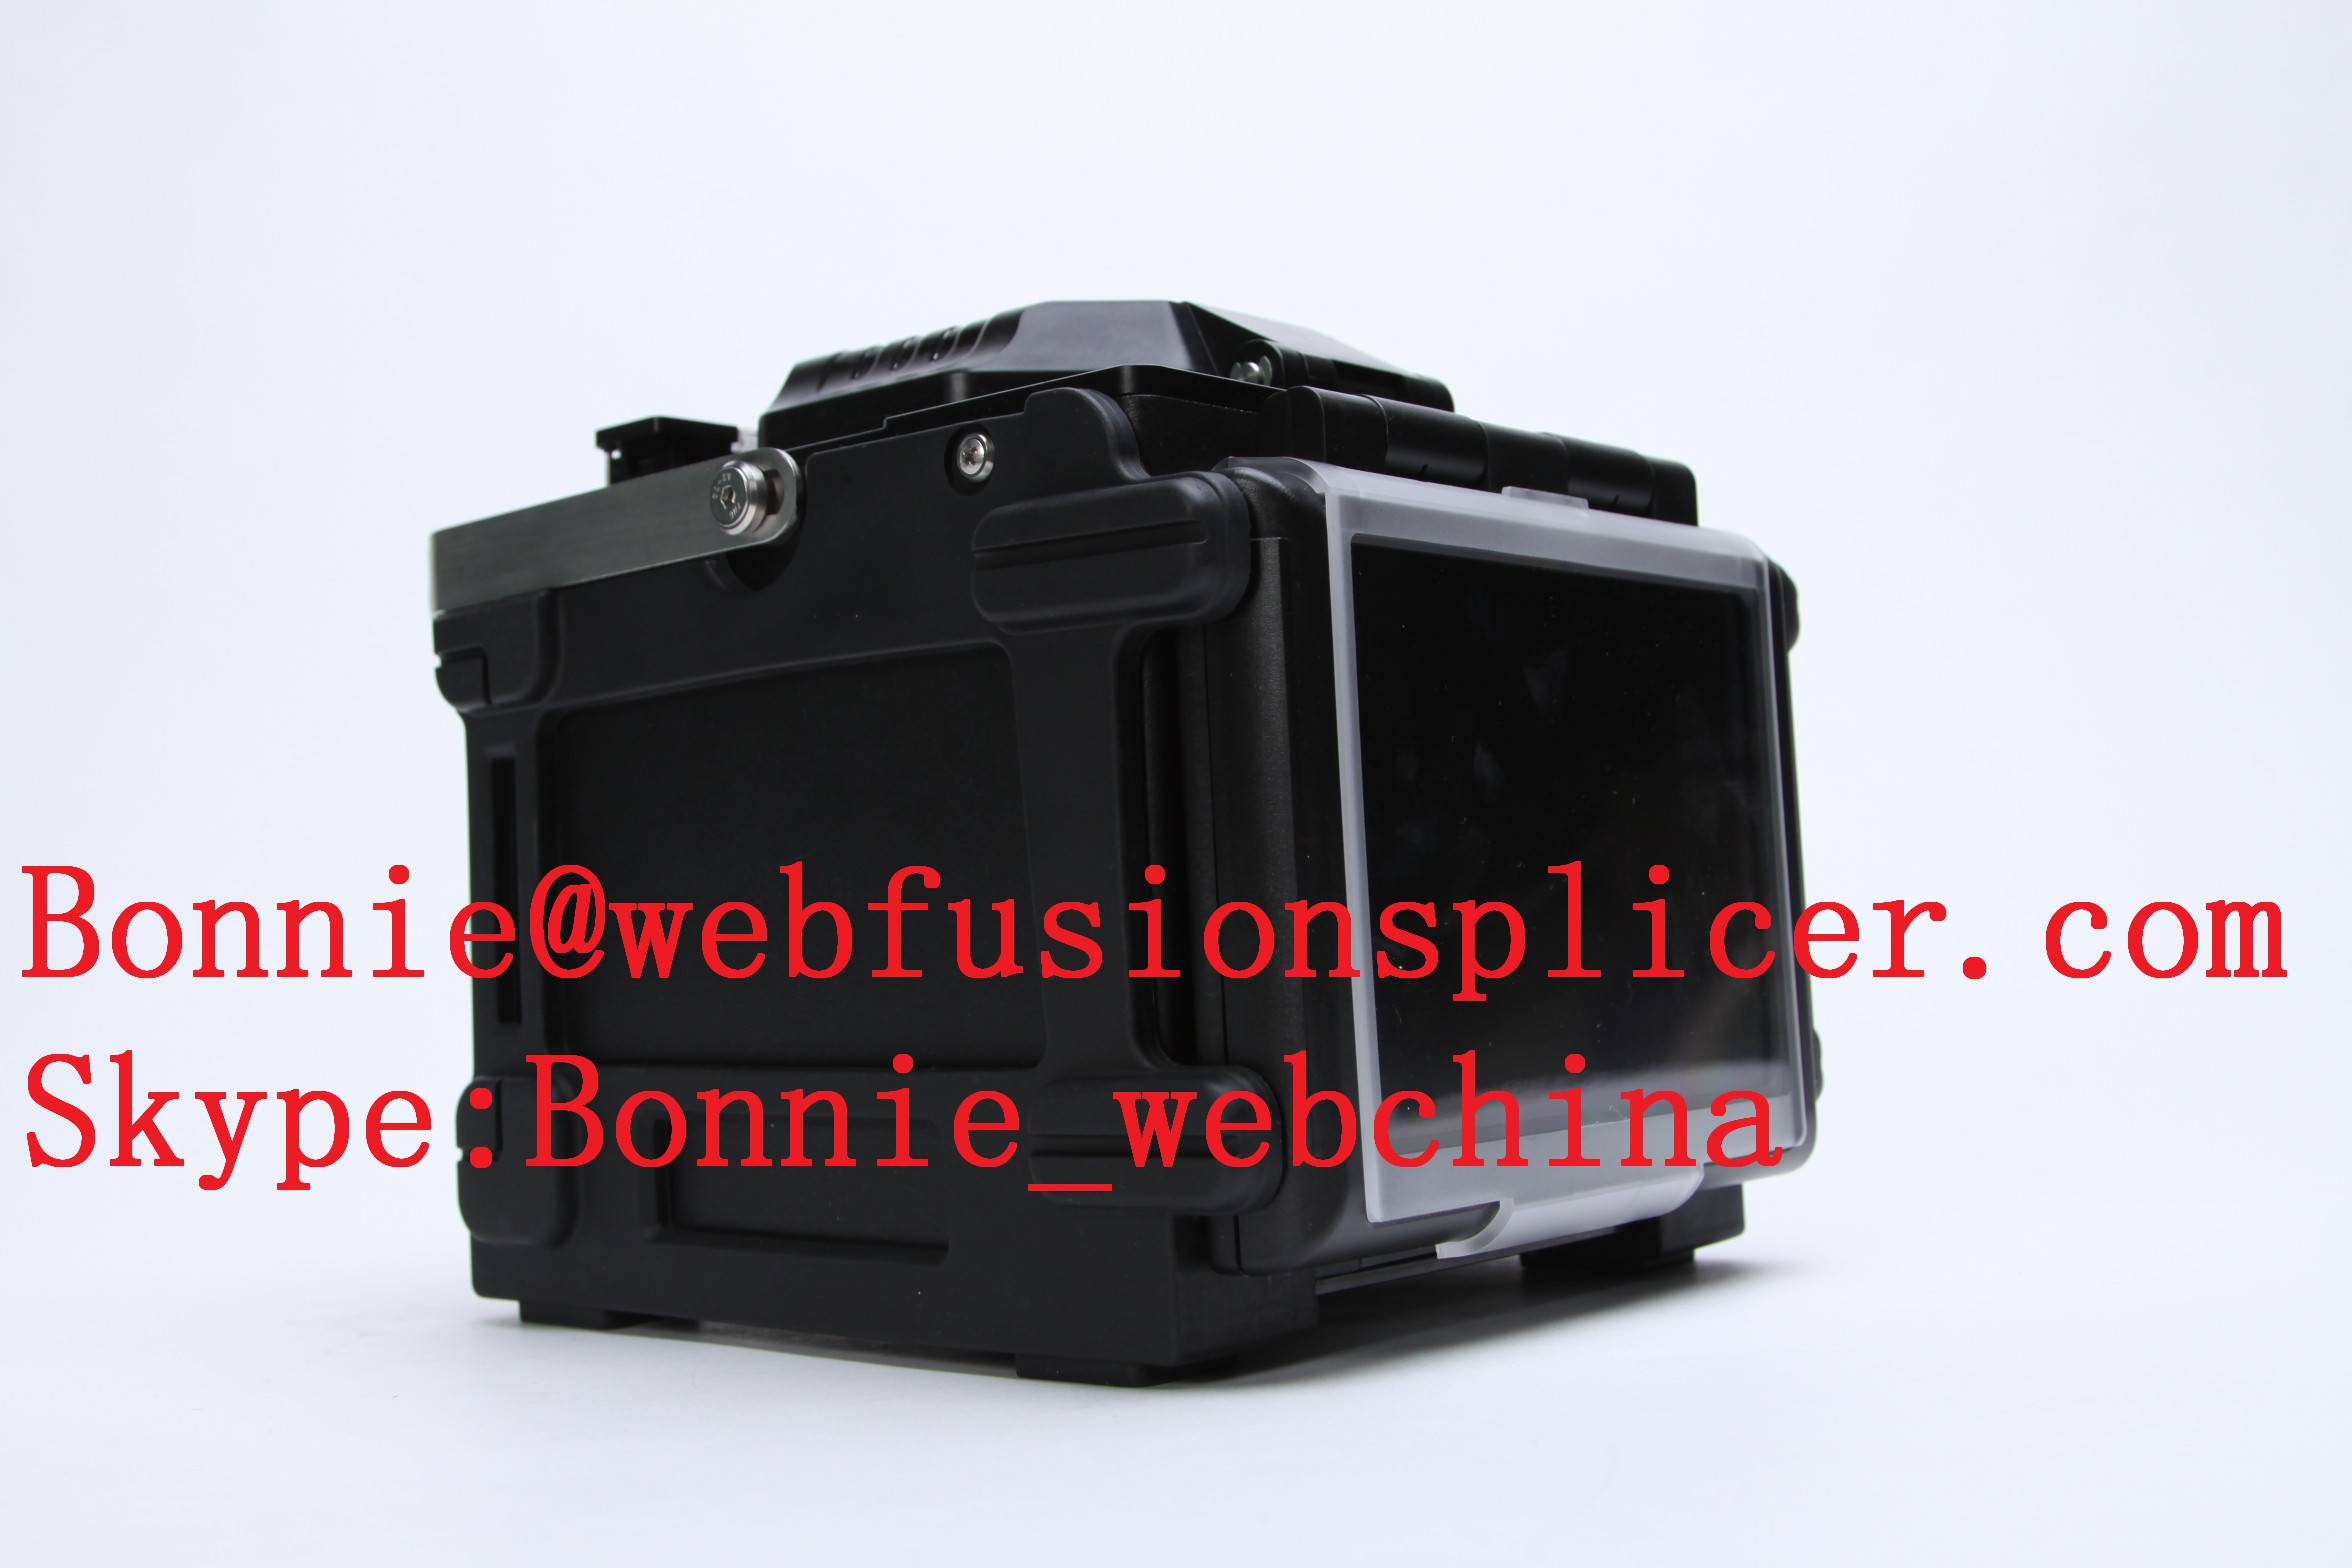 Alignment Fusion Splicer/Fiber Splicing Machine Kit optical fiber fusion machine